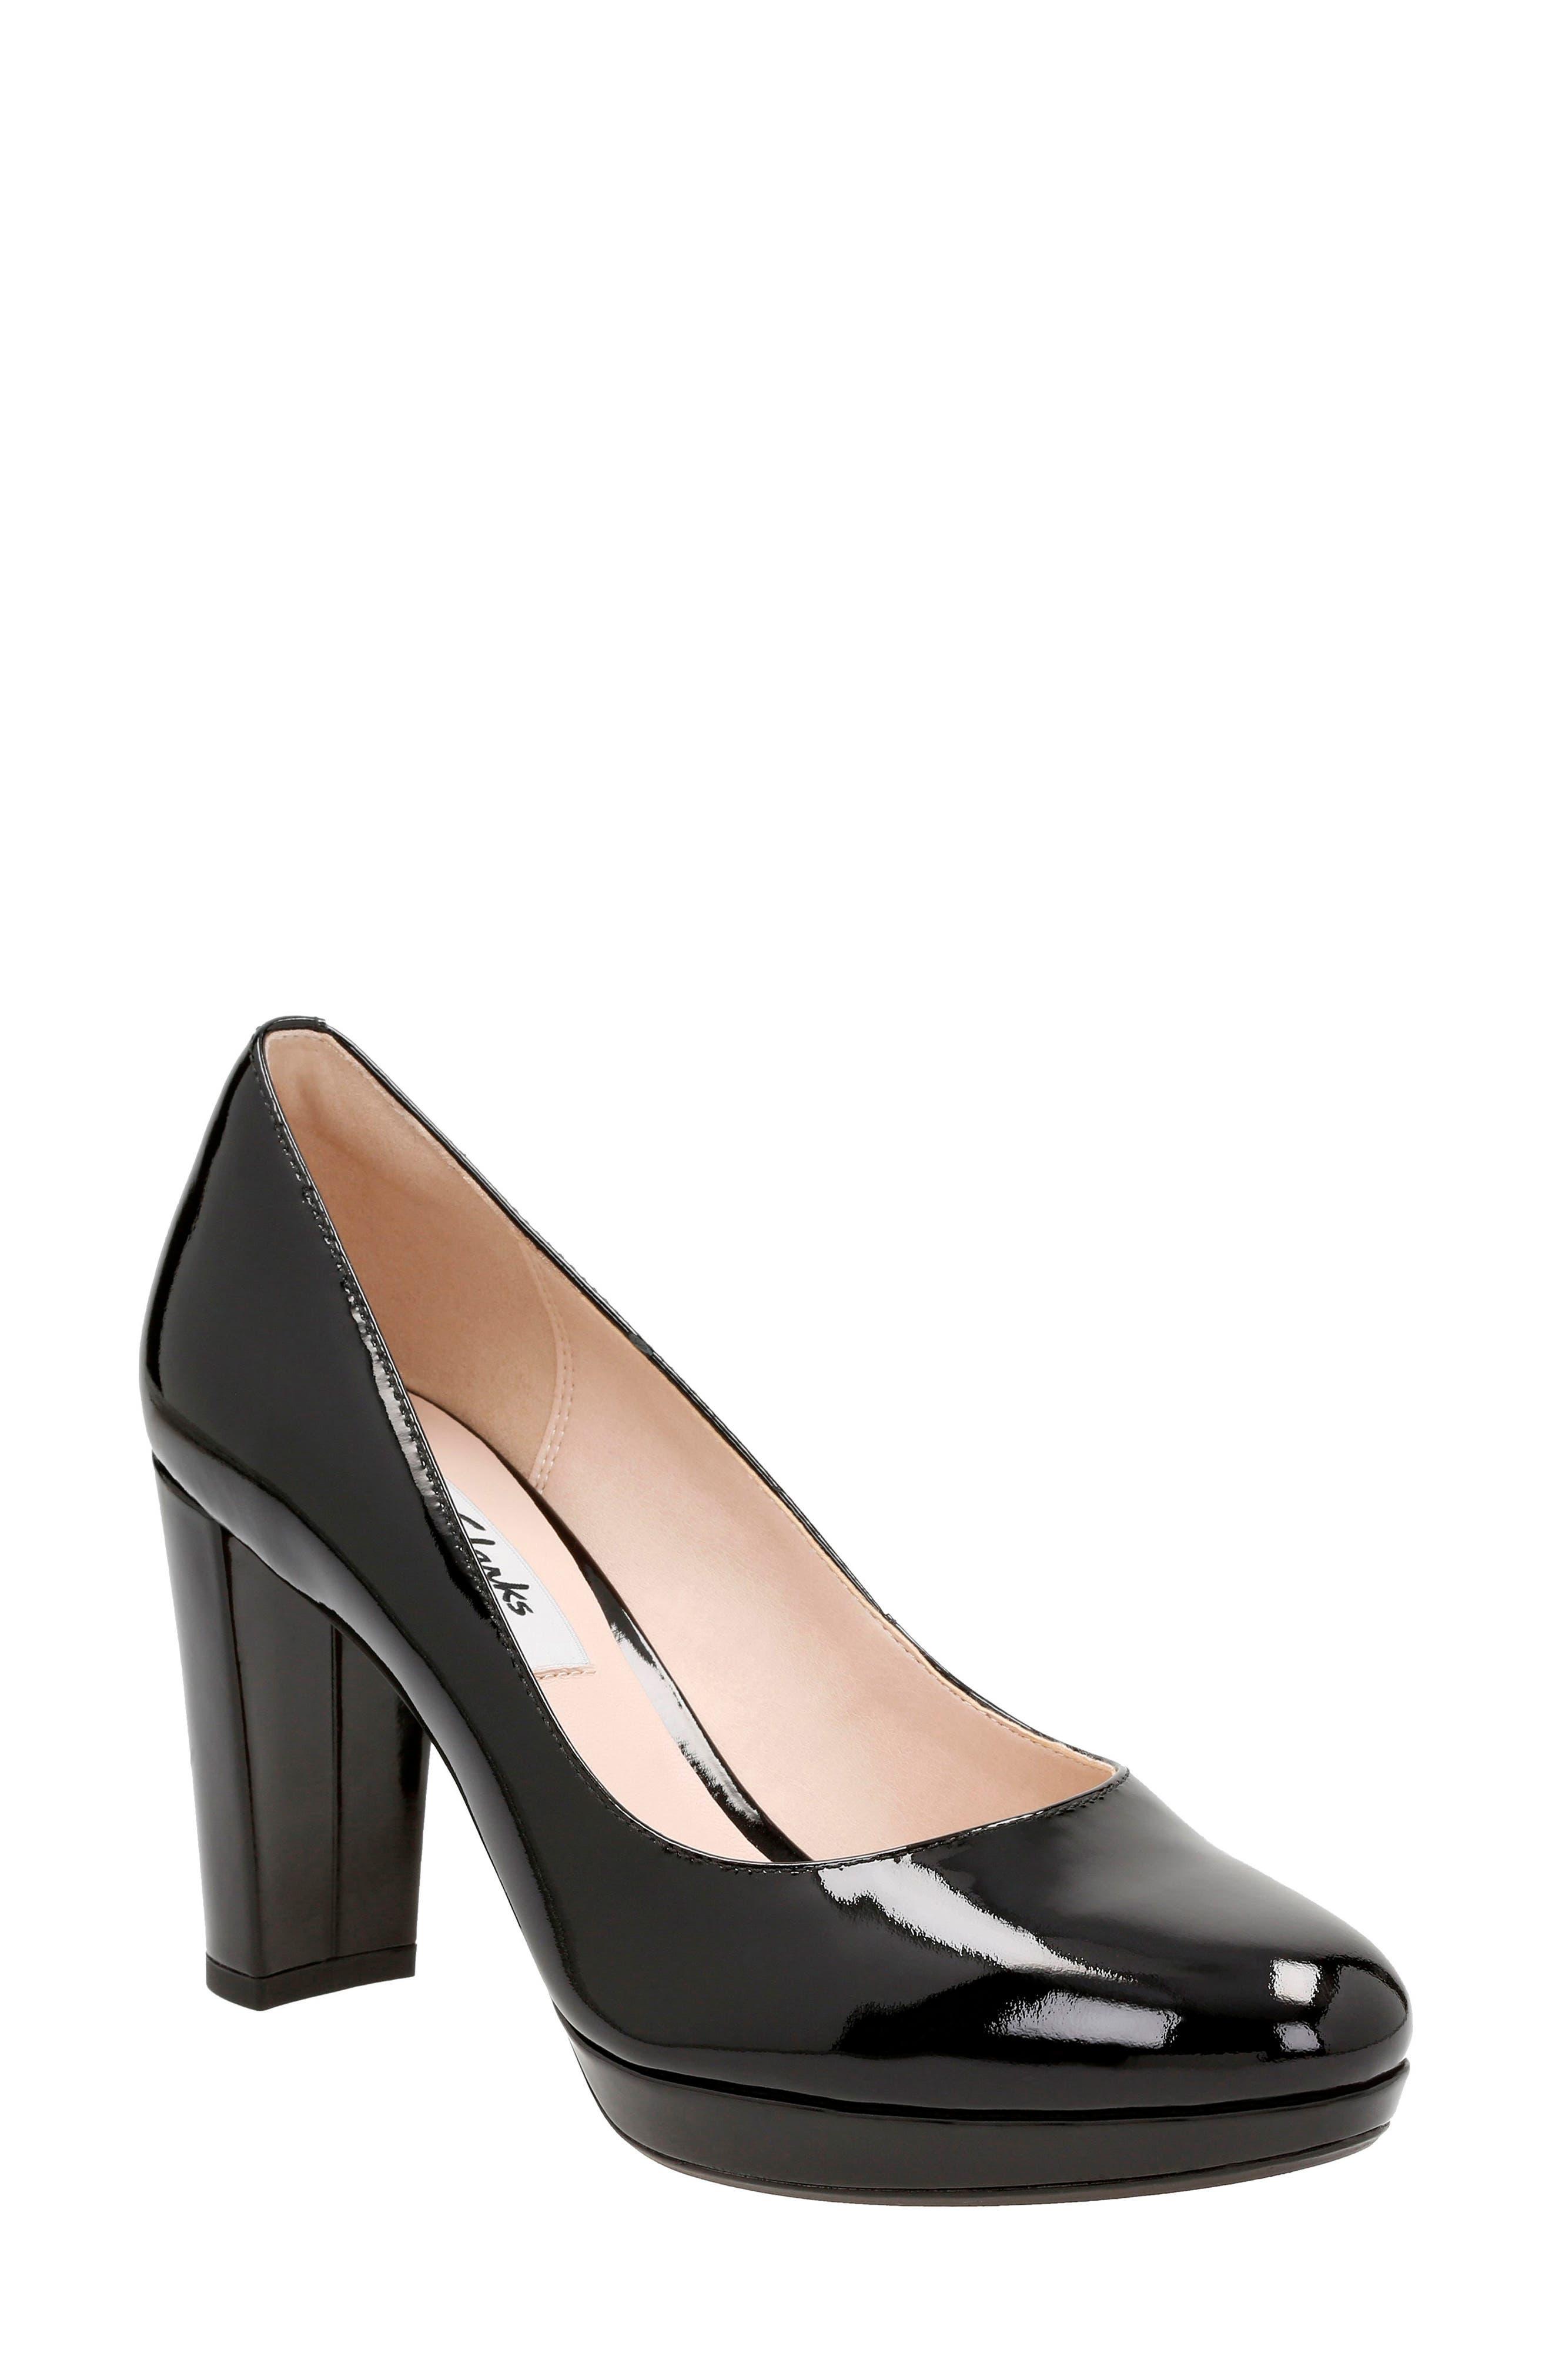 Alternate Image 1 Selected - Clarks® Kendra Sienna Almond Toe Pump (Women)